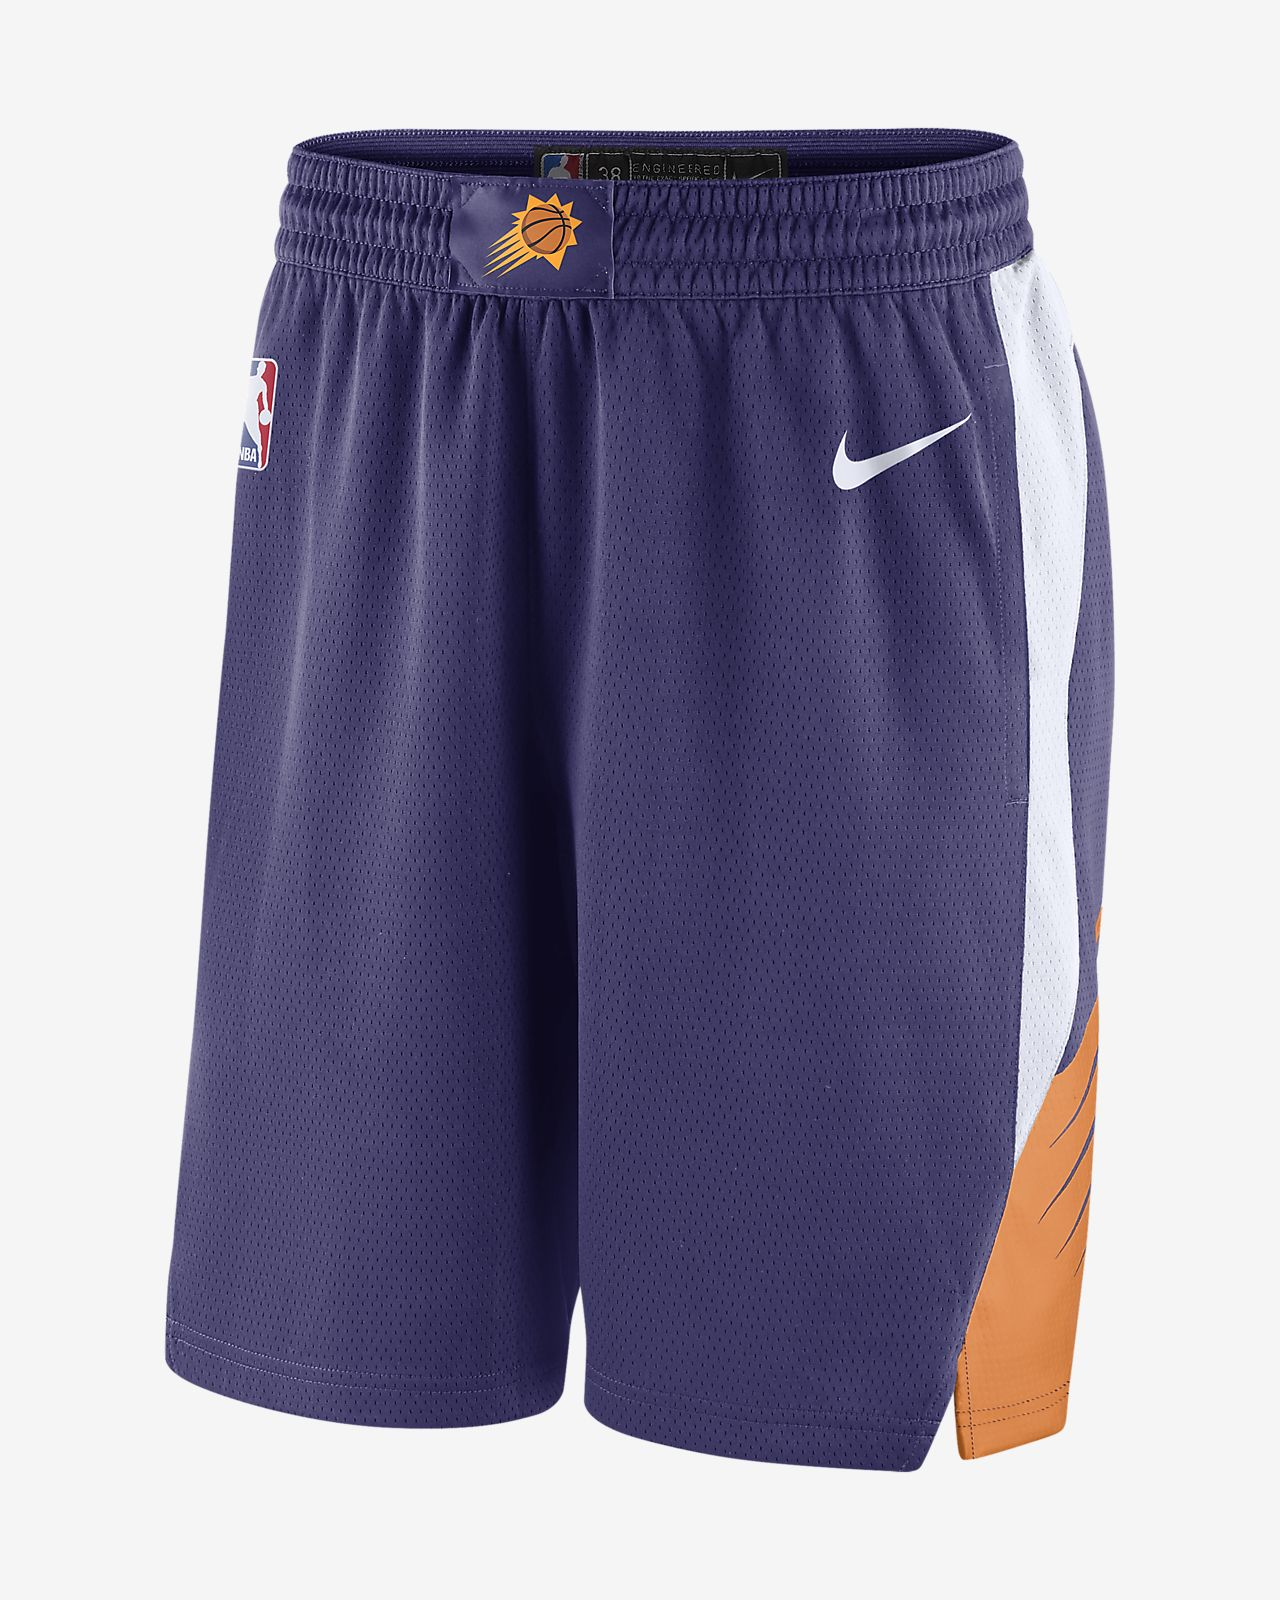 Phoenix Suns Icon Edition Swingman Men's Nike NBA Shorts